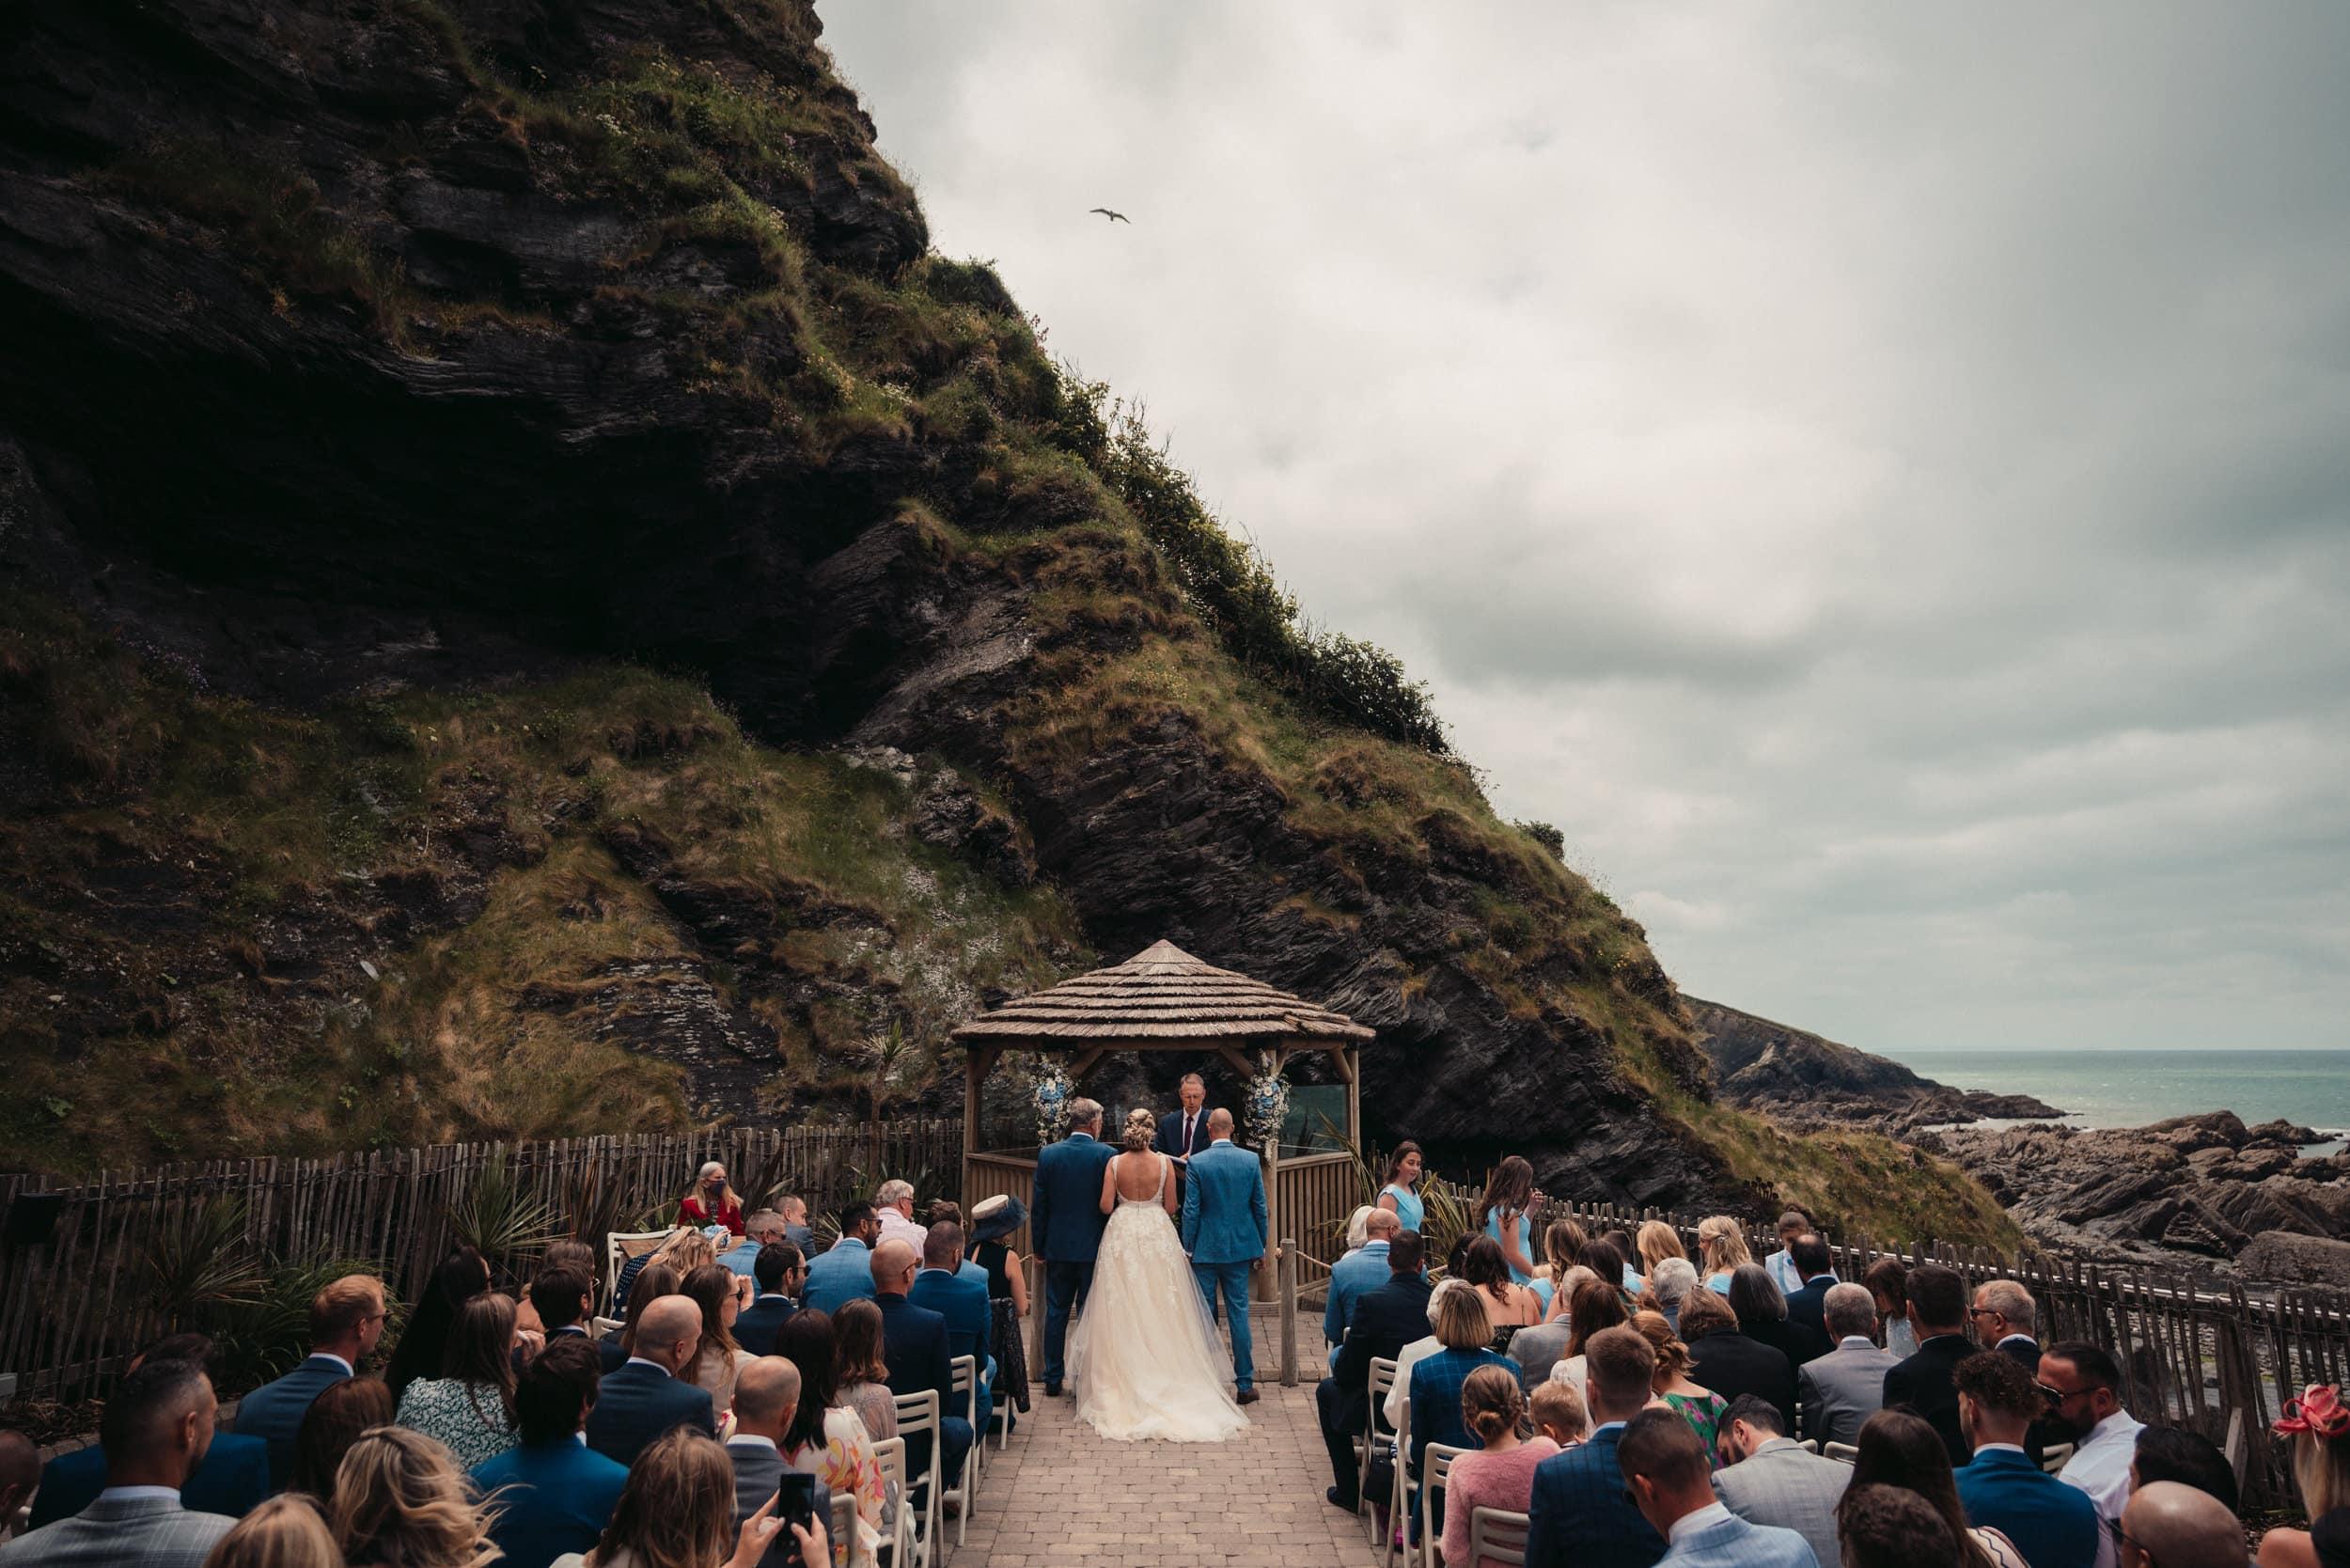 coastal ceremony taking place in devon